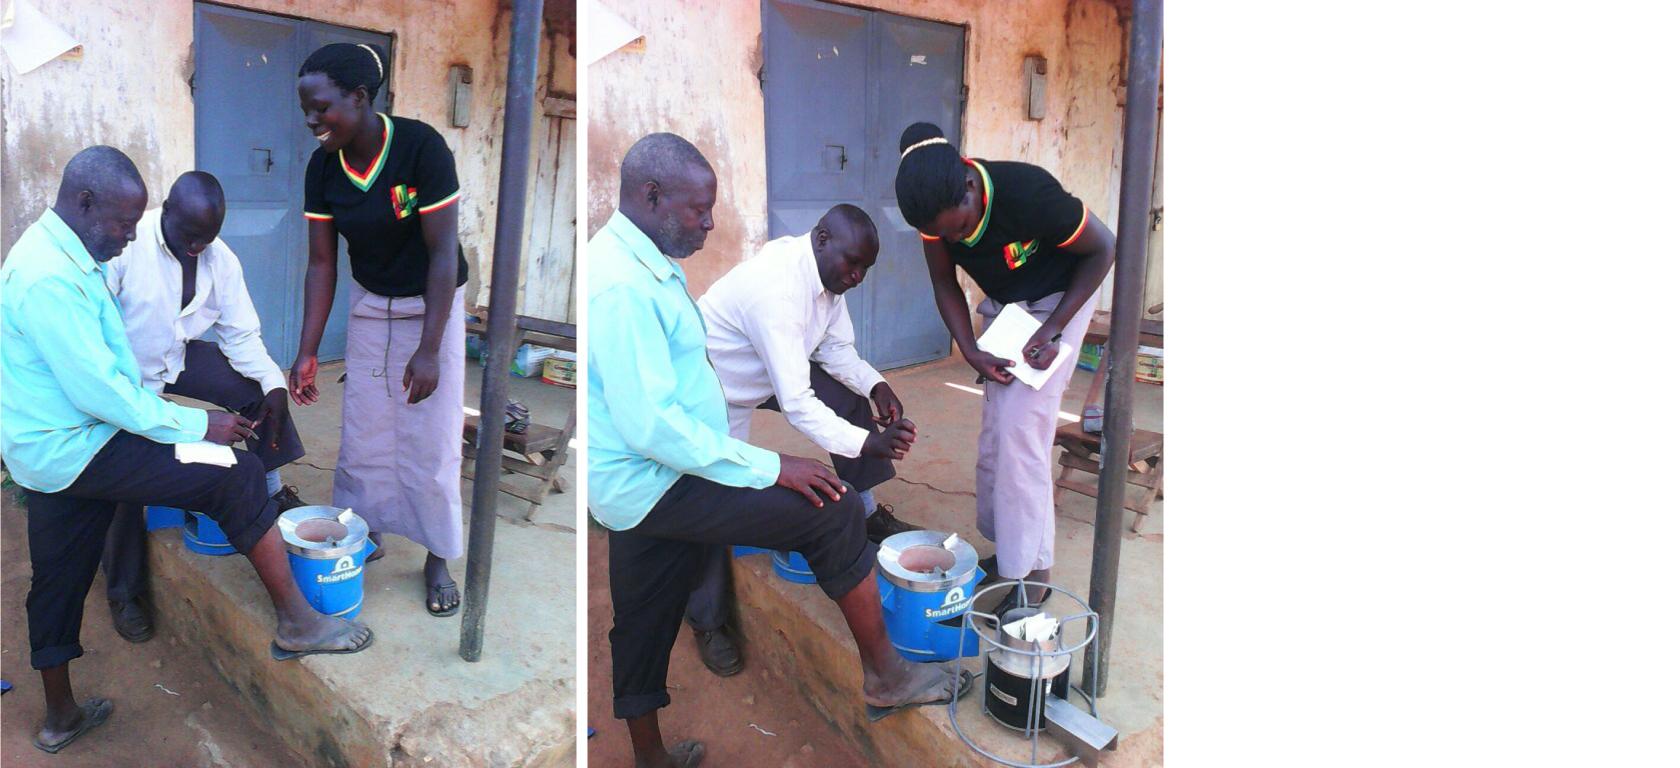 Micro-entrepreneur selling a SmartHome cookstove in Eastern Uganda.